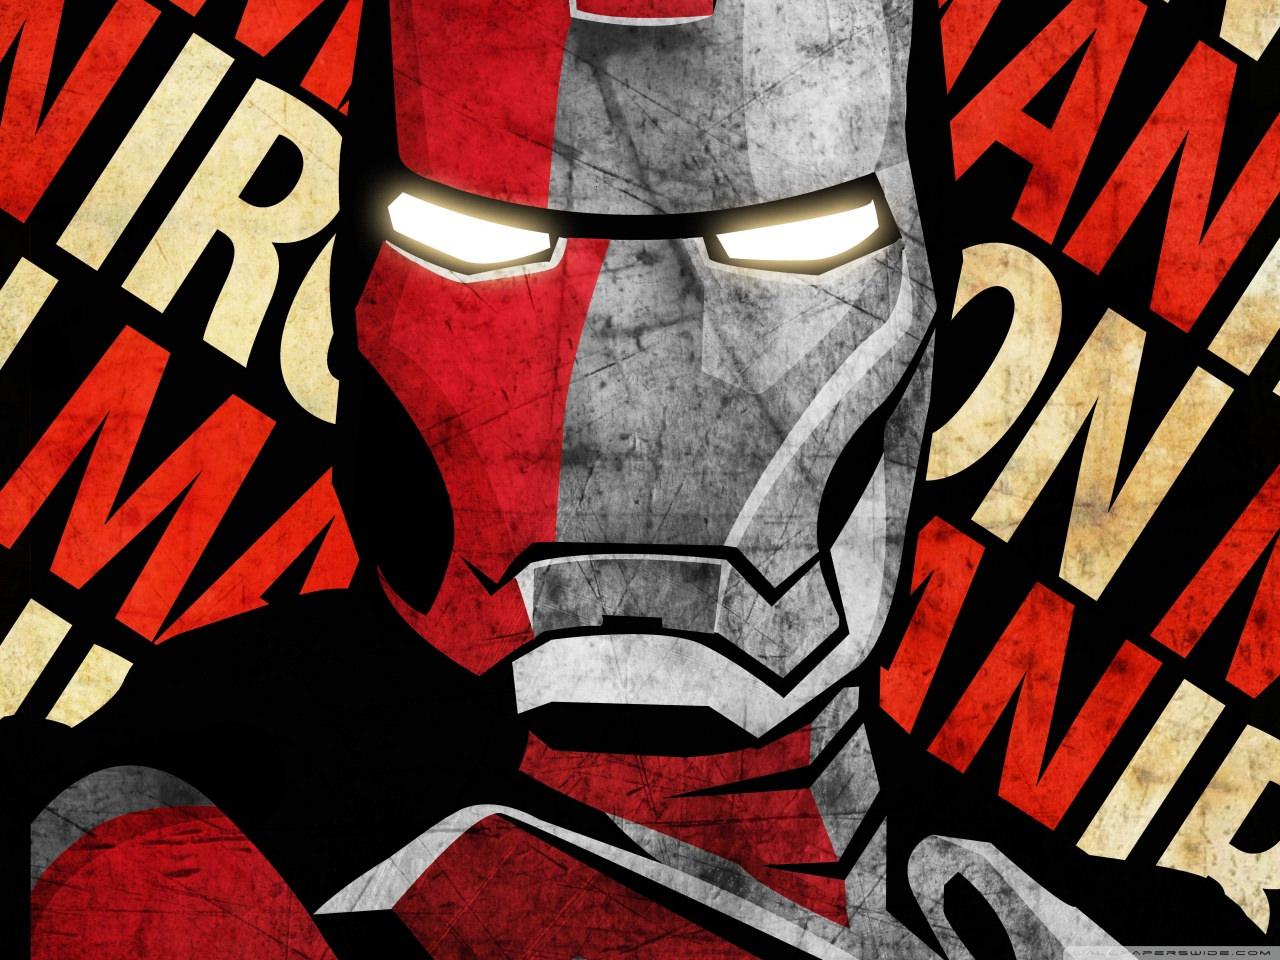 Iron Man Poster Wallpaper